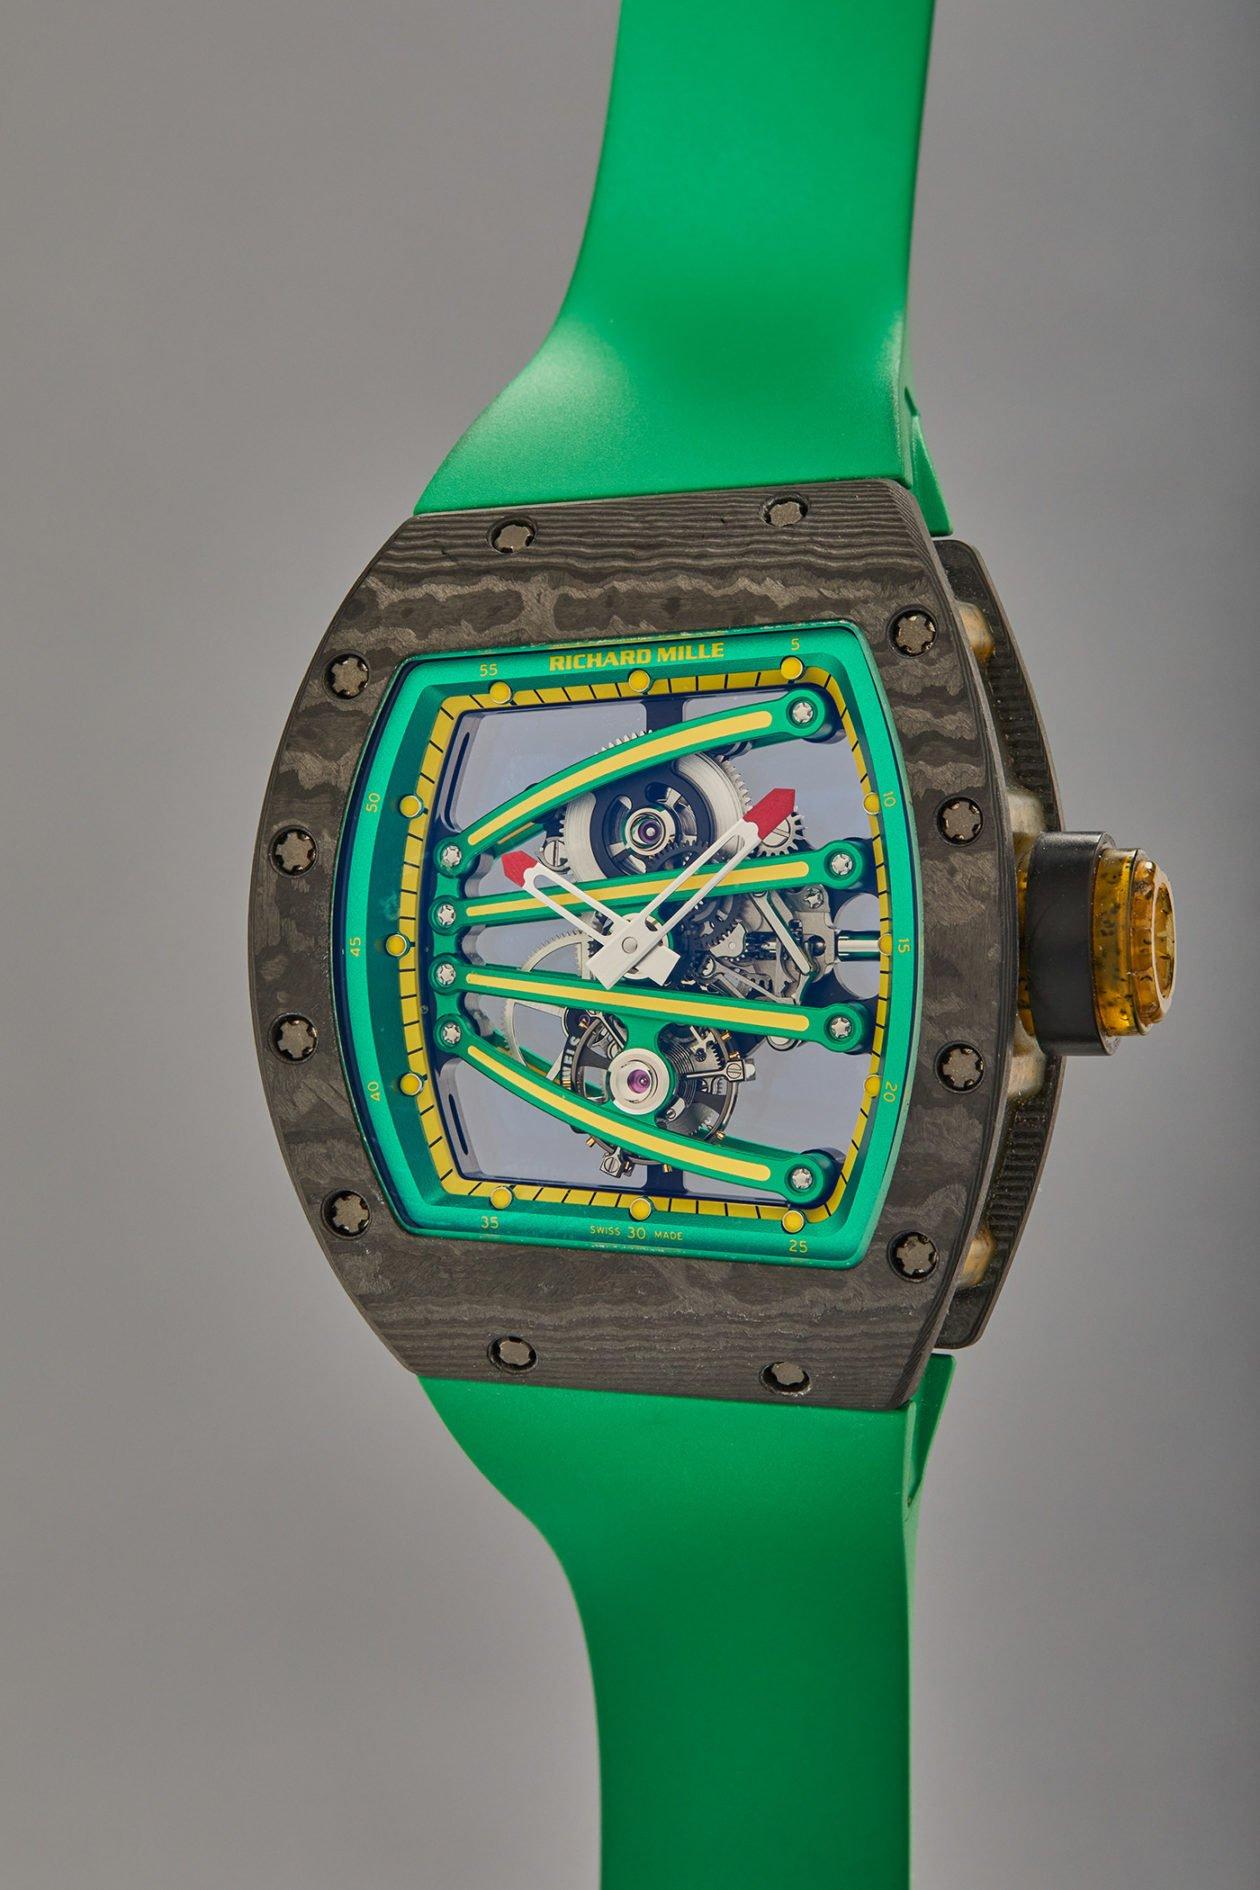 Richard Mille RM 59-01 Yohan Blake